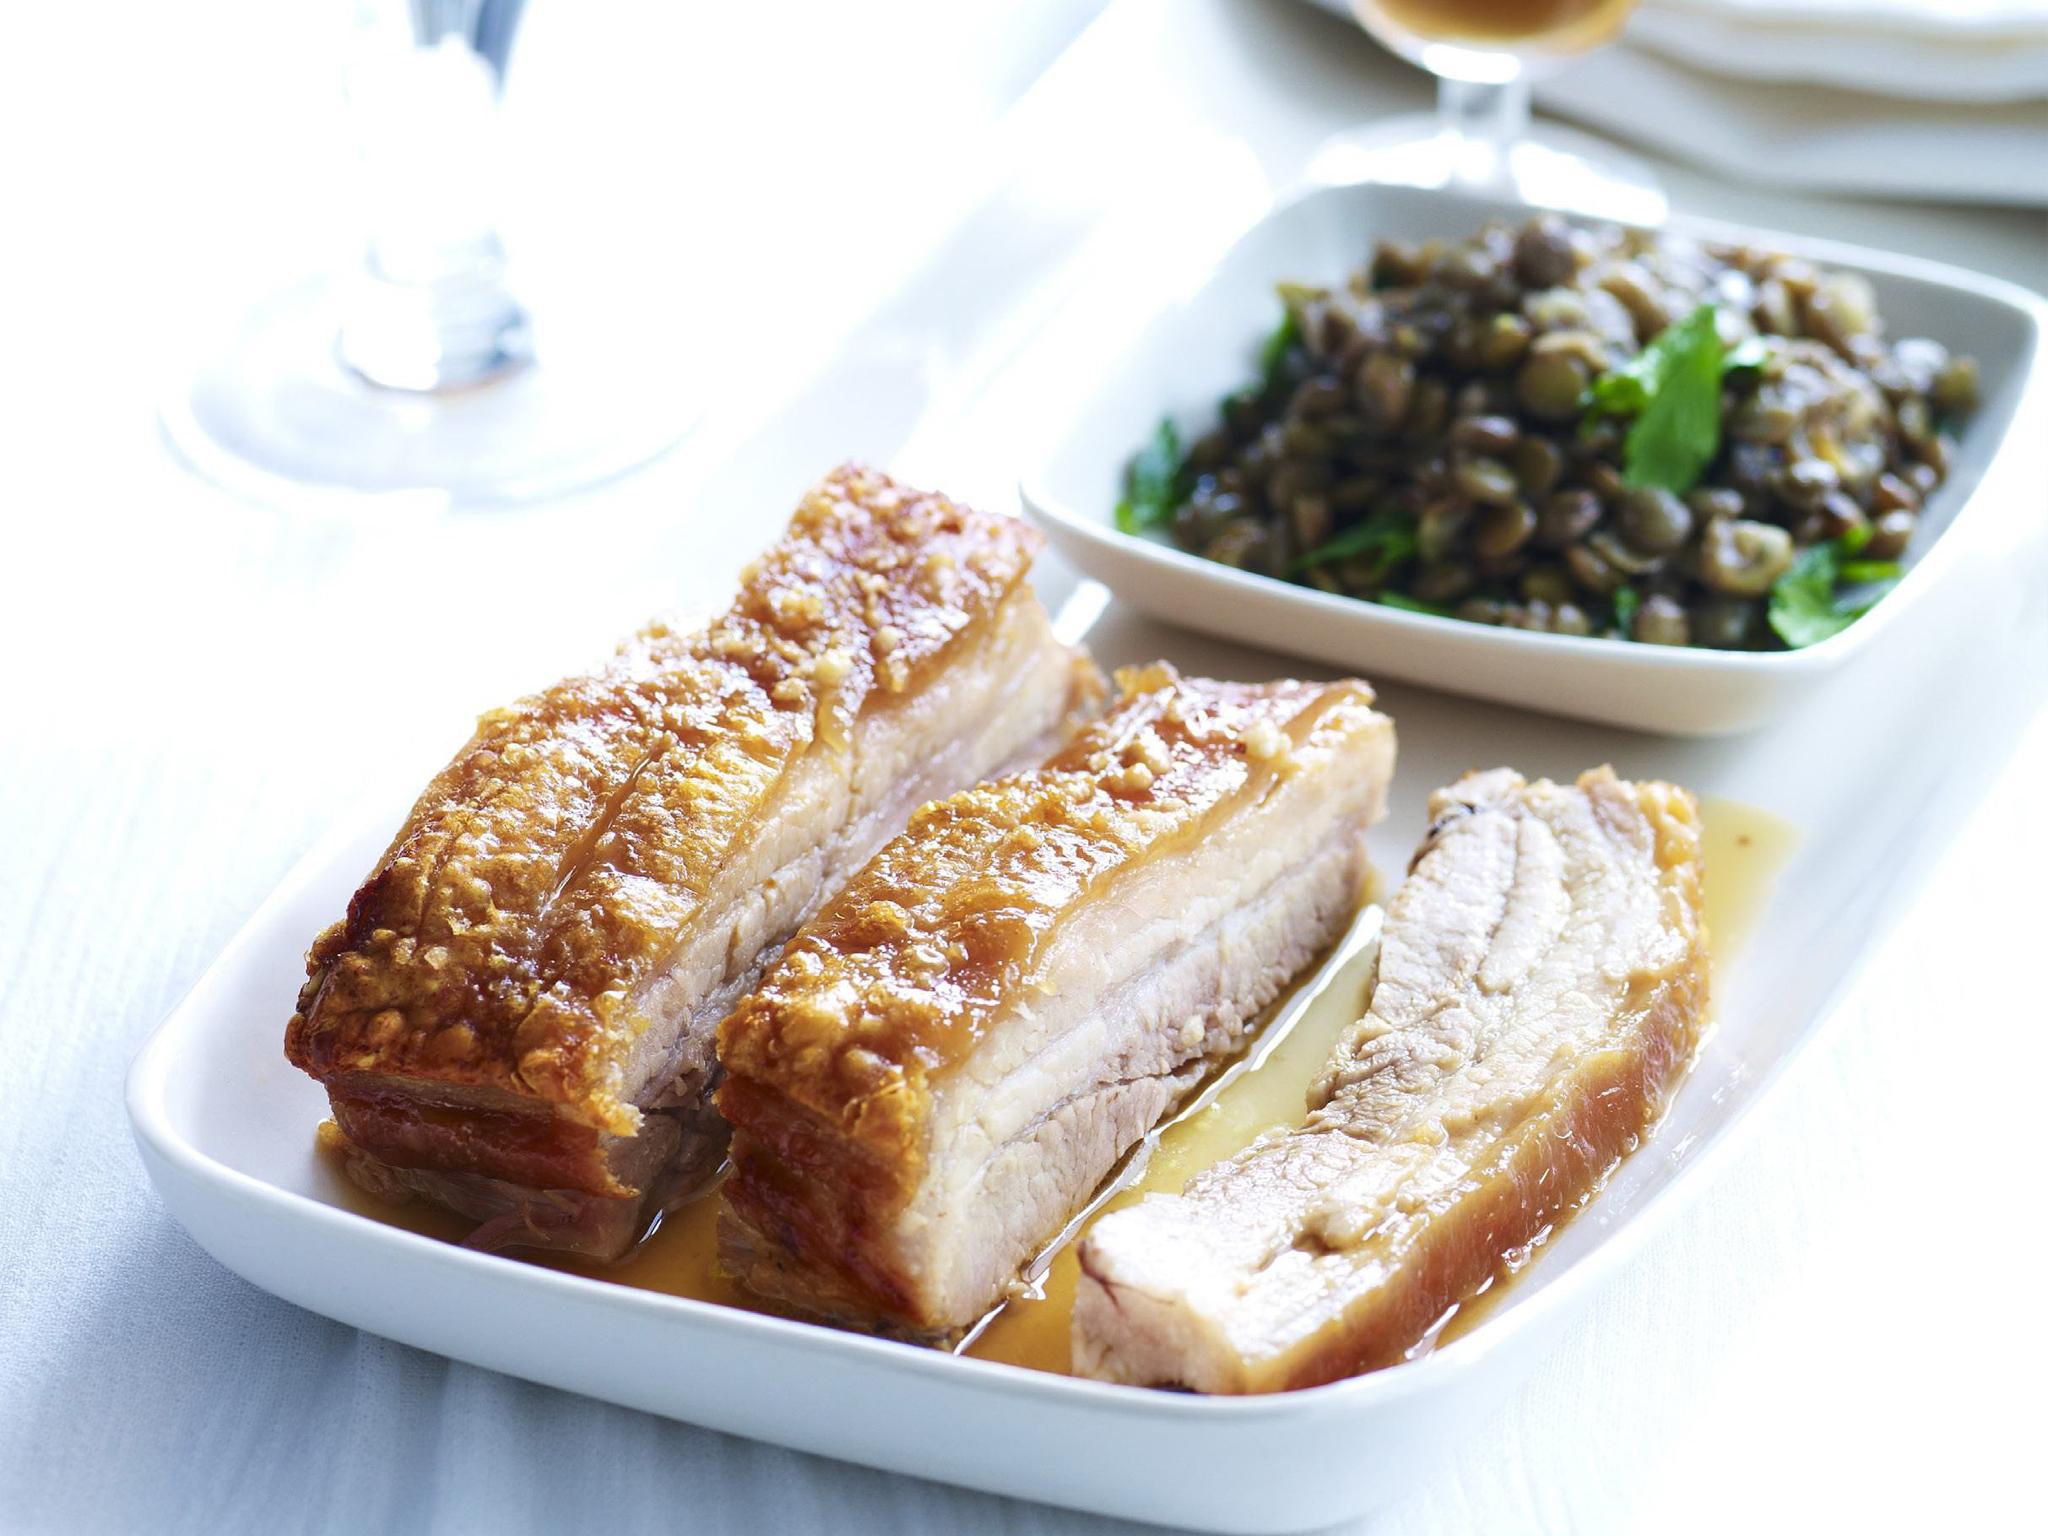 Braised Lentils and Roast Pork Loin (The Perfect Winter Meal) Braised Lentils and Roast Pork Loin (The Perfect Winter Meal) new images